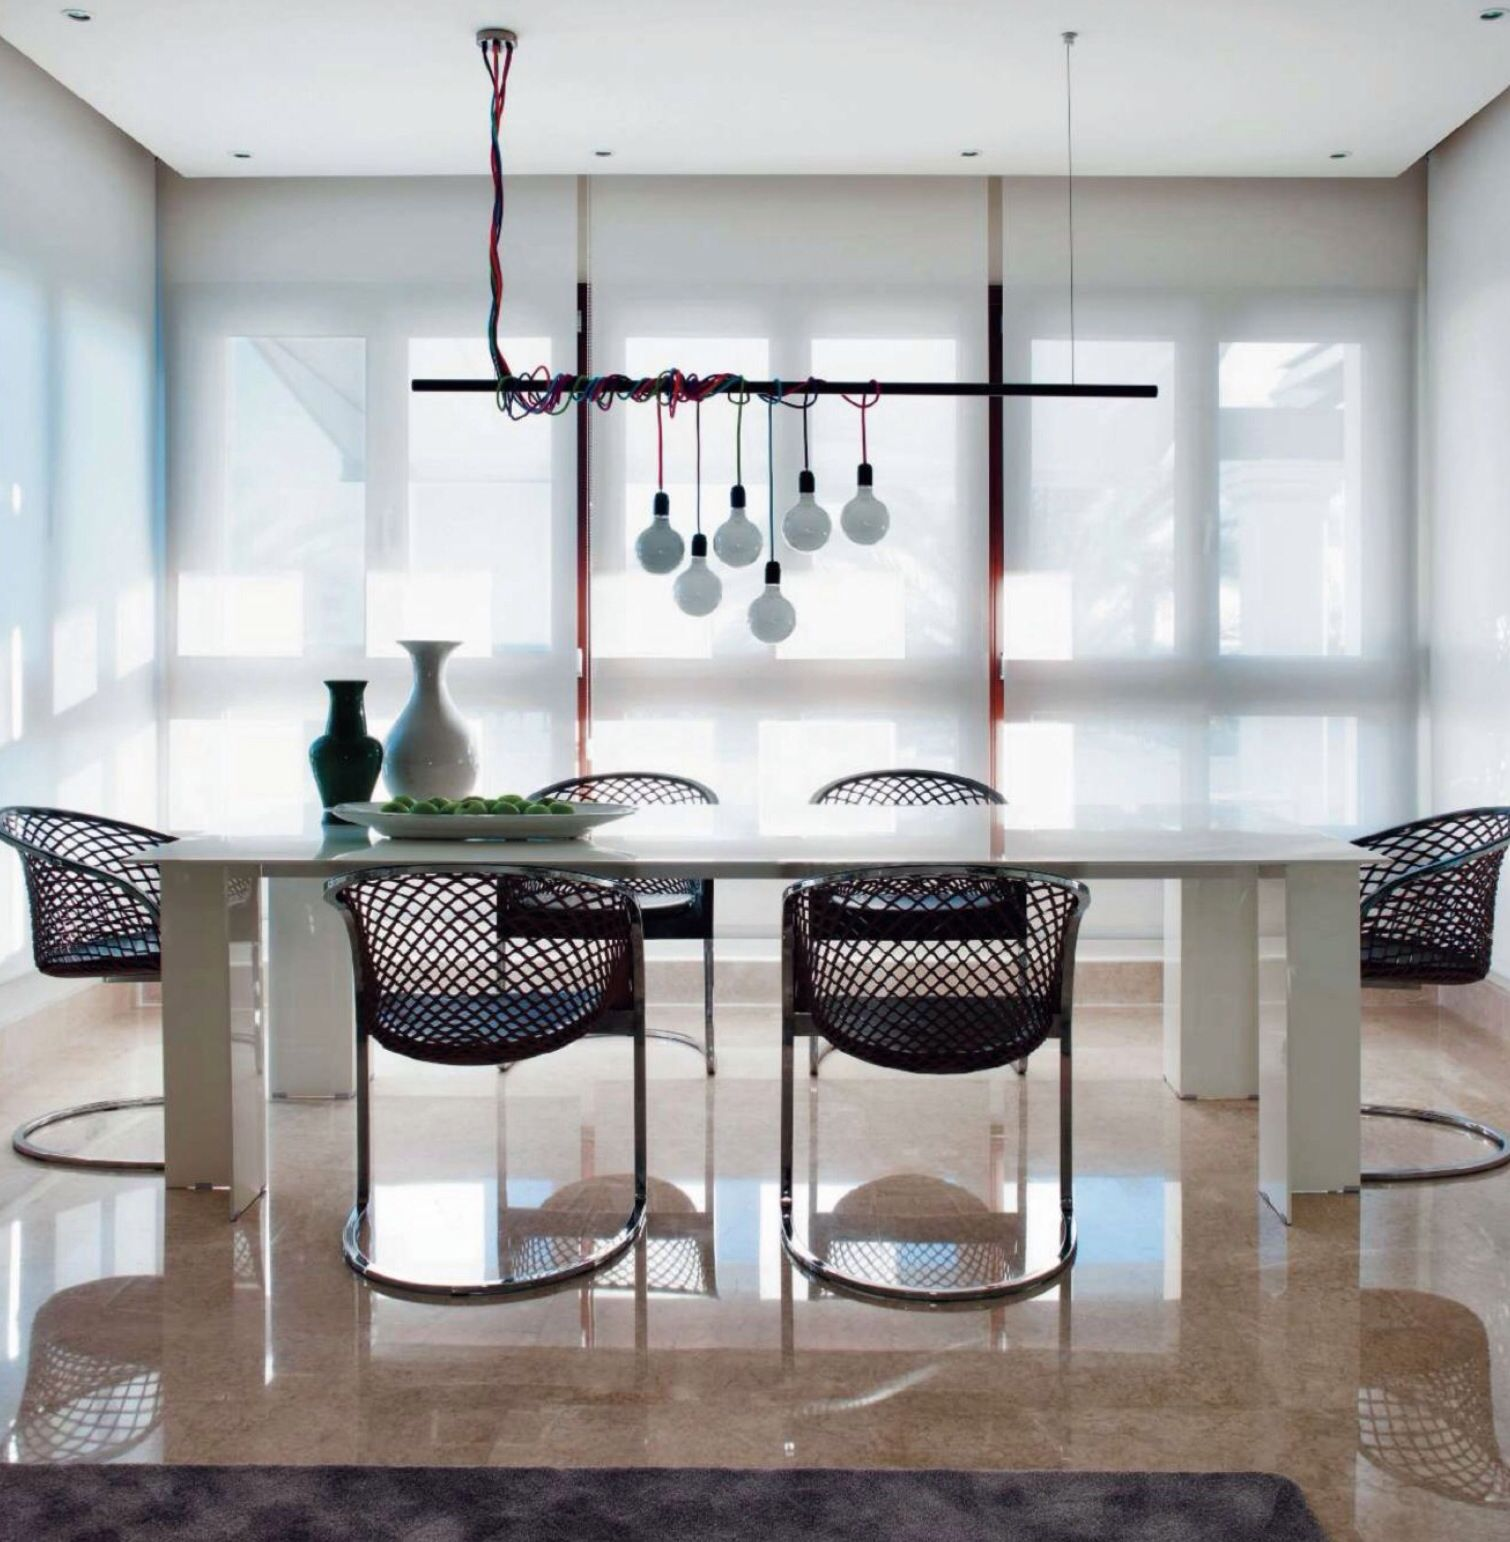 Matteo Kitchens: Lámpara Diseño De Pedro Peña Sobre Mesa De Aluminio Lacado